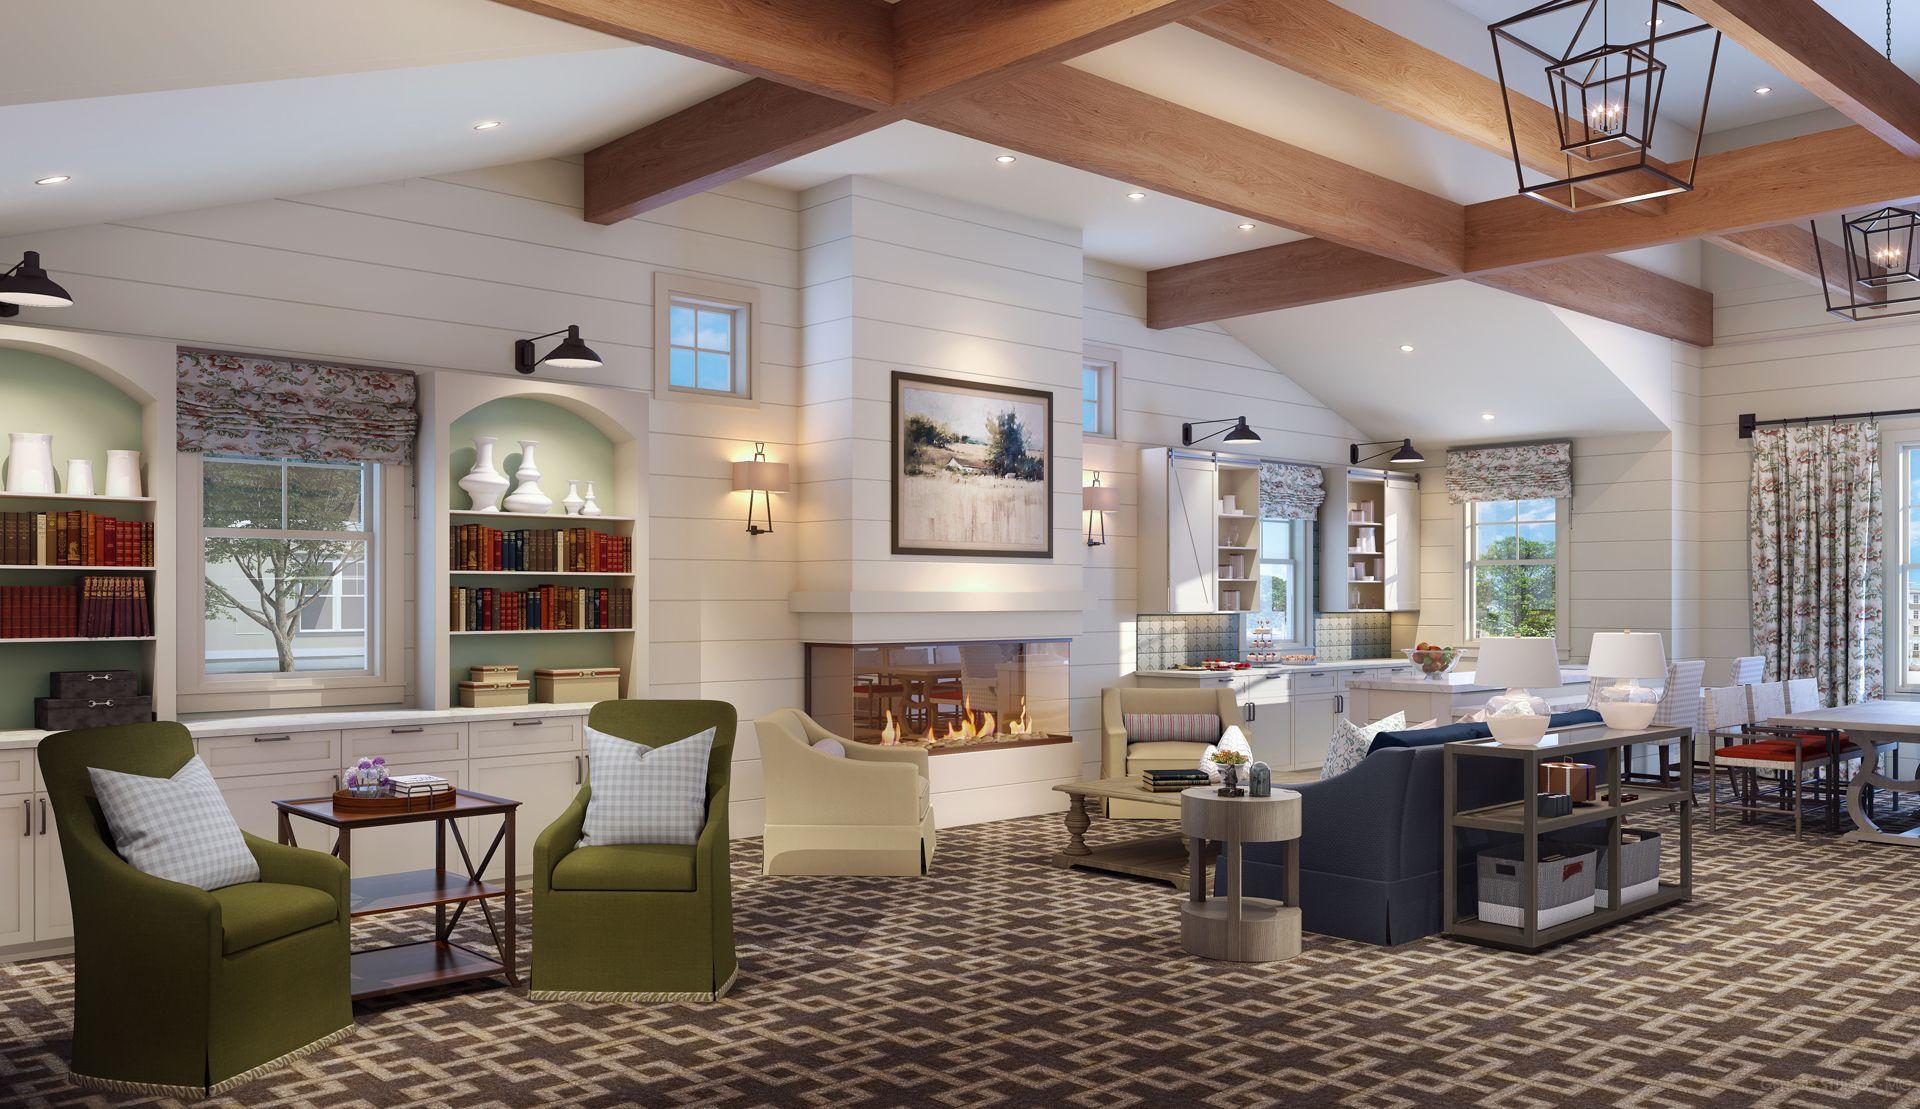 3d Architectural Rendering Interior Rendering Beautiful Dining Rooms 3d Architectural Rendering